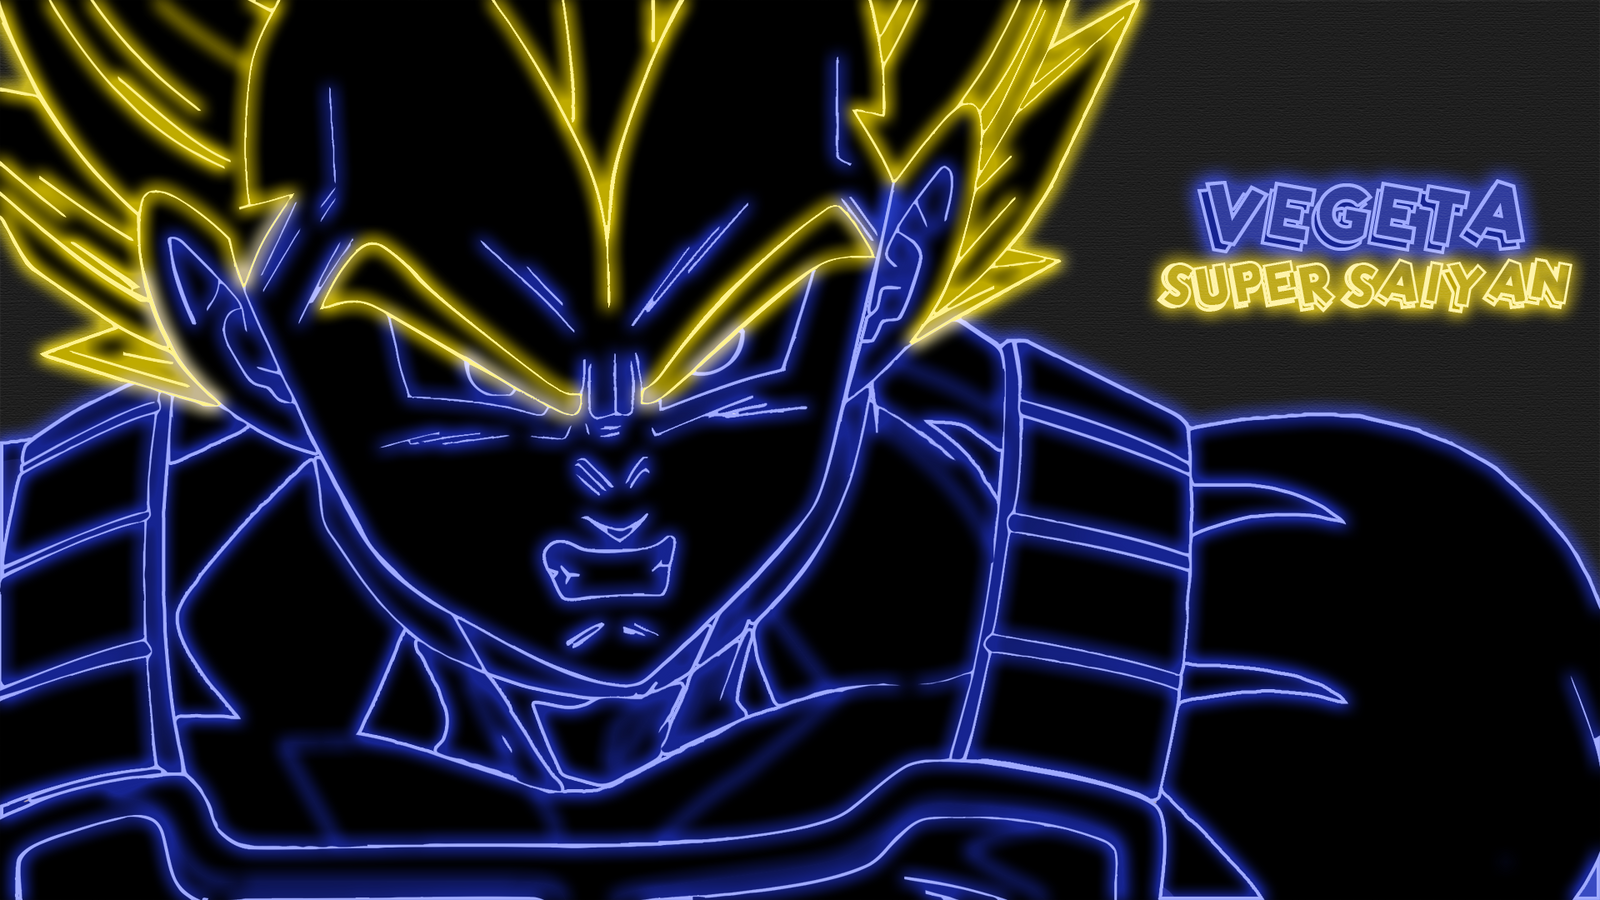 Vegeta Super Saiyan Neon Wallpaper By GT4tube